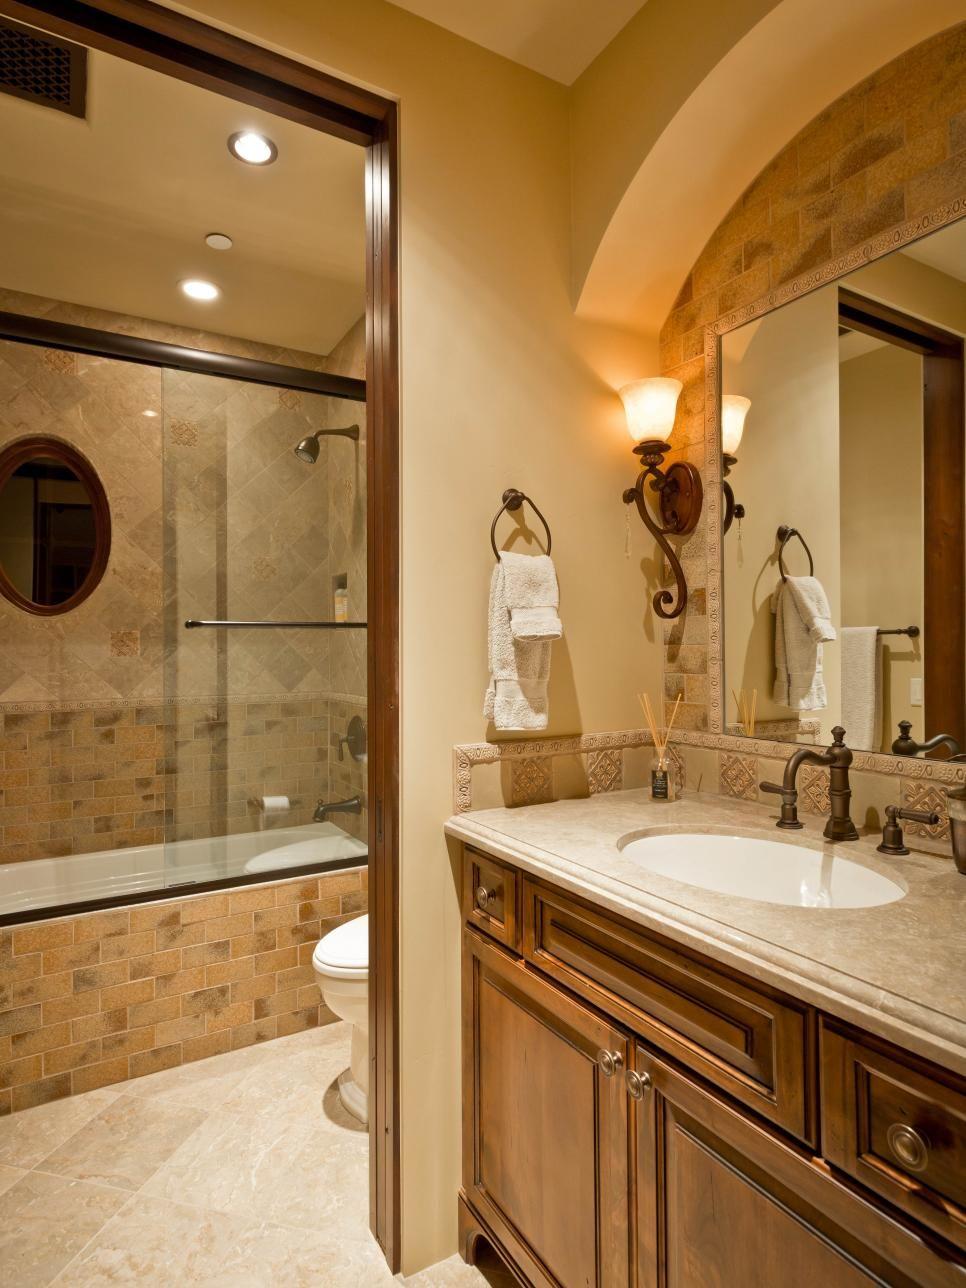 A Mediterranean bathroom is decorated in a warm, neutral palette ...